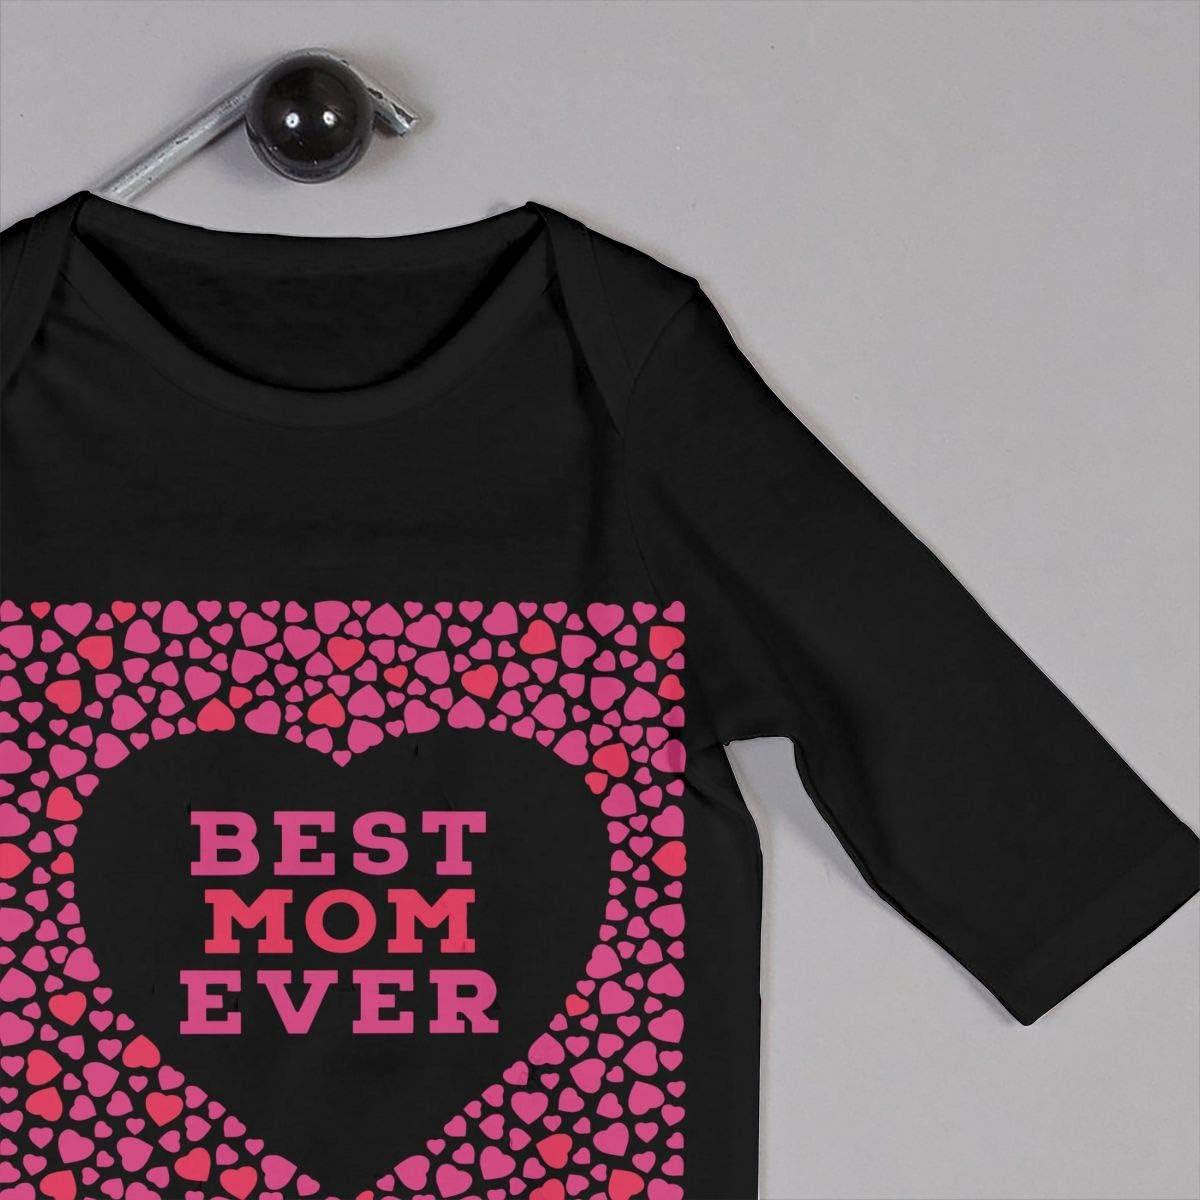 YELTY6F Best Mom Ever Printed Baby Bodysuit Long Sleeve Romper Black